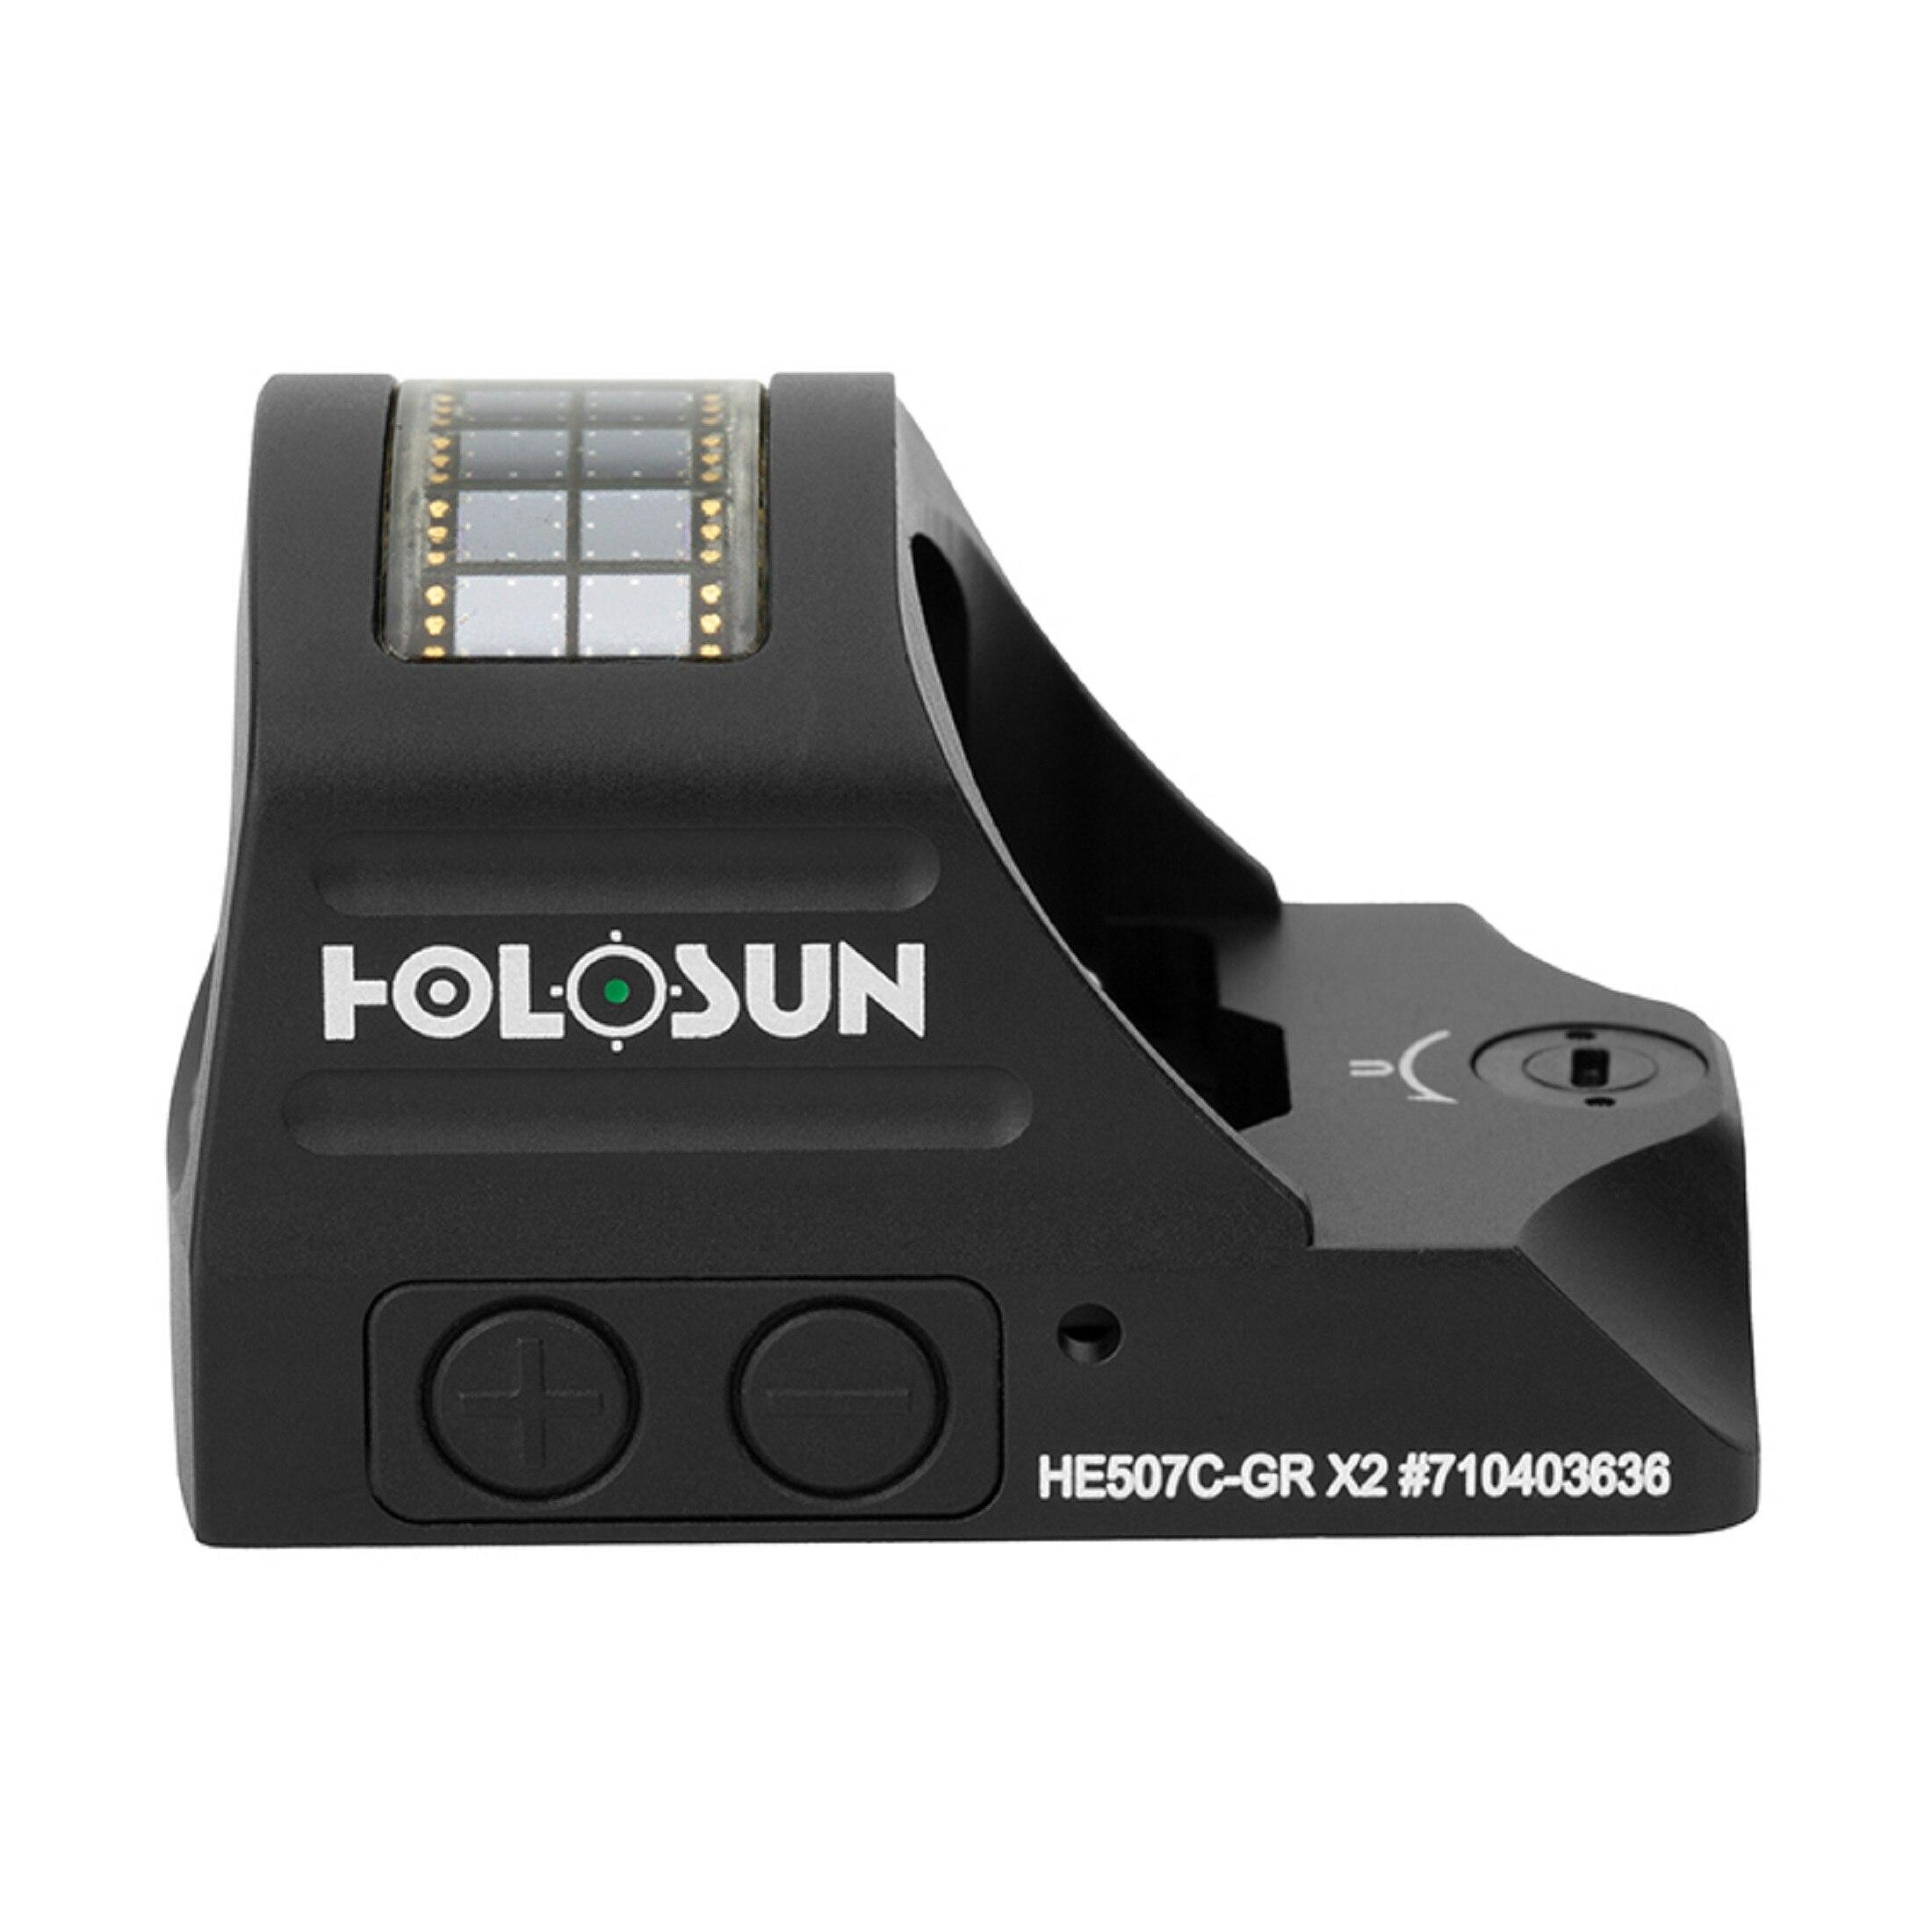 Holosun Dot Sight ELITE HE507C-GR-X2